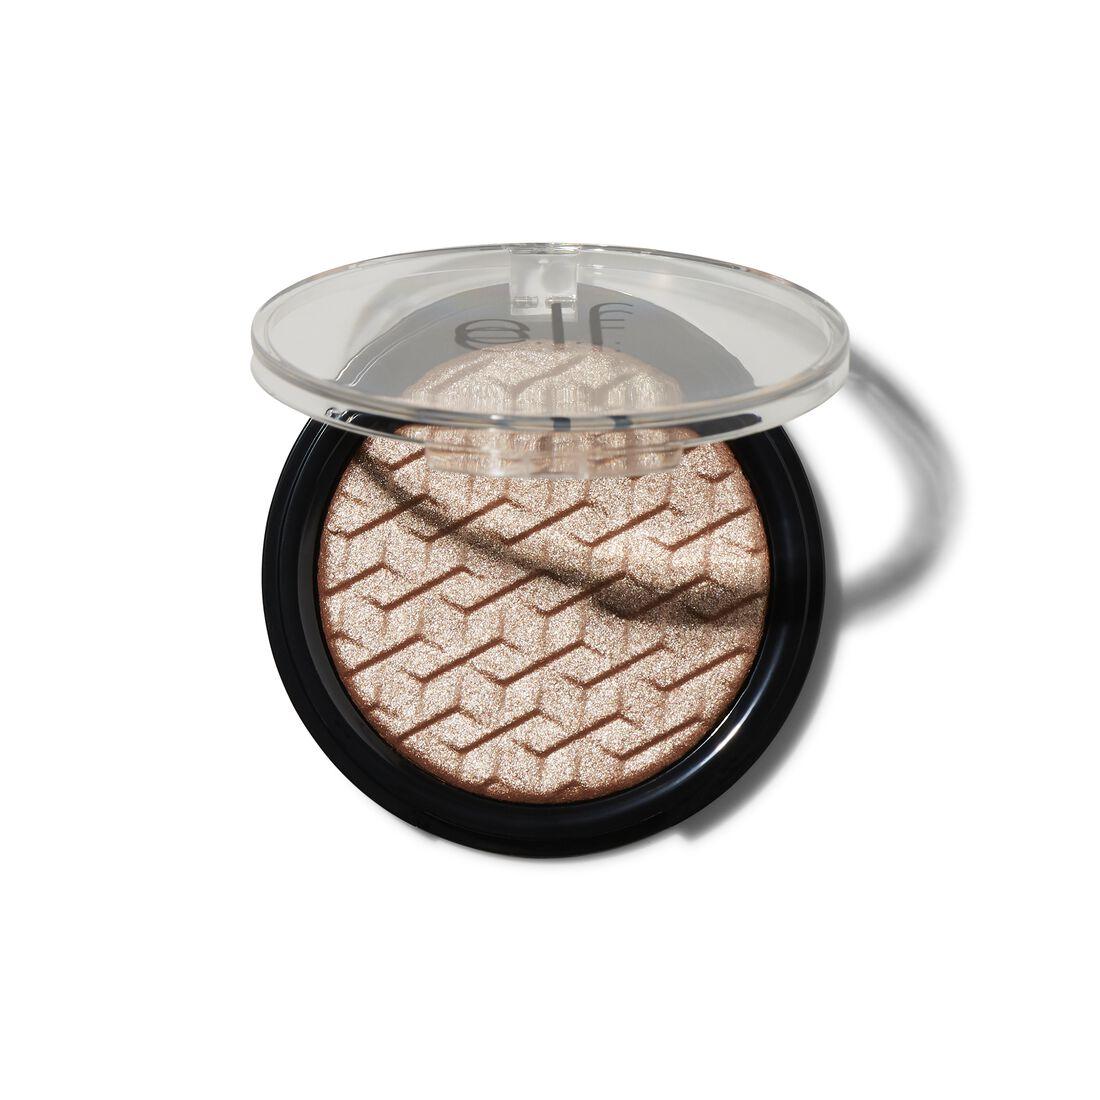 e.l.f. Cosmetics - Metallic Flare Highlighter